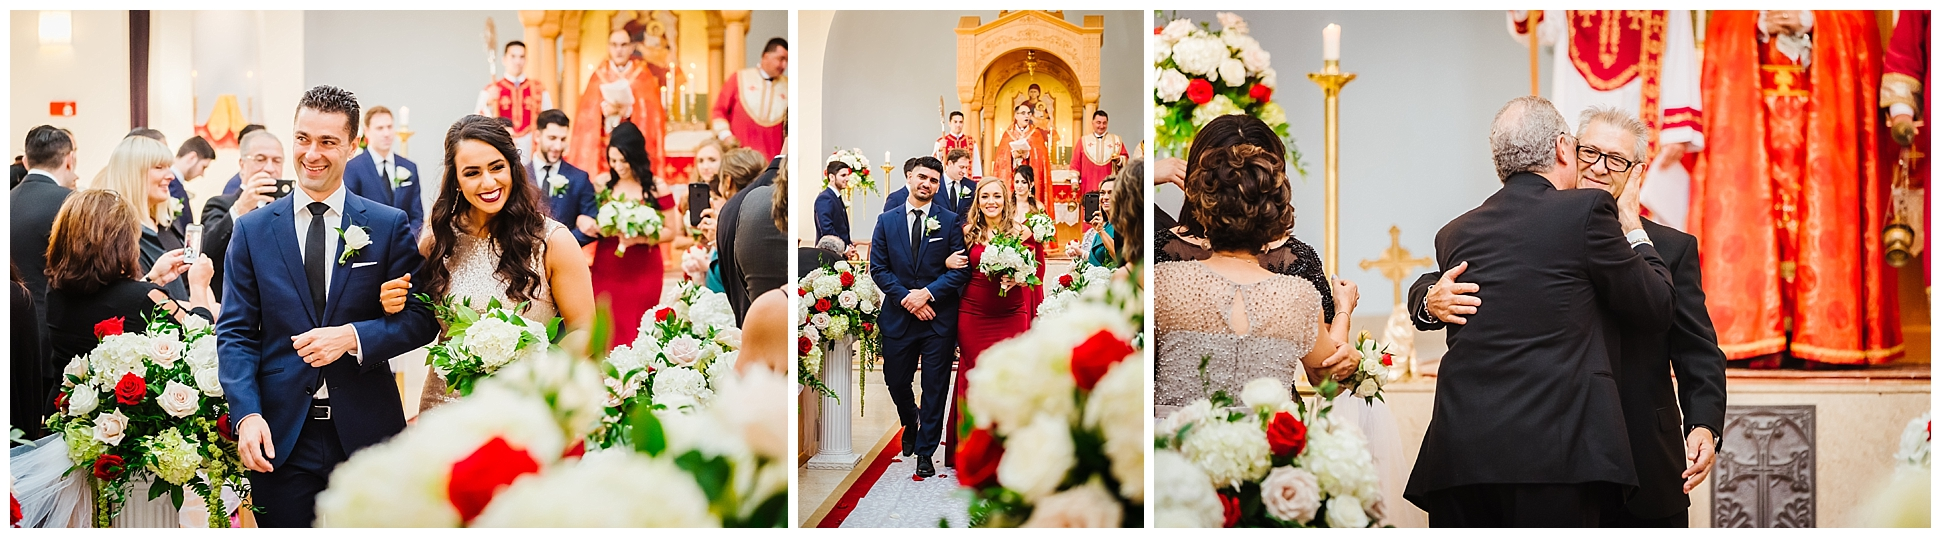 indian-armenian-clearwater-wedding-chic-luxury-photogaphy_0065.jpg